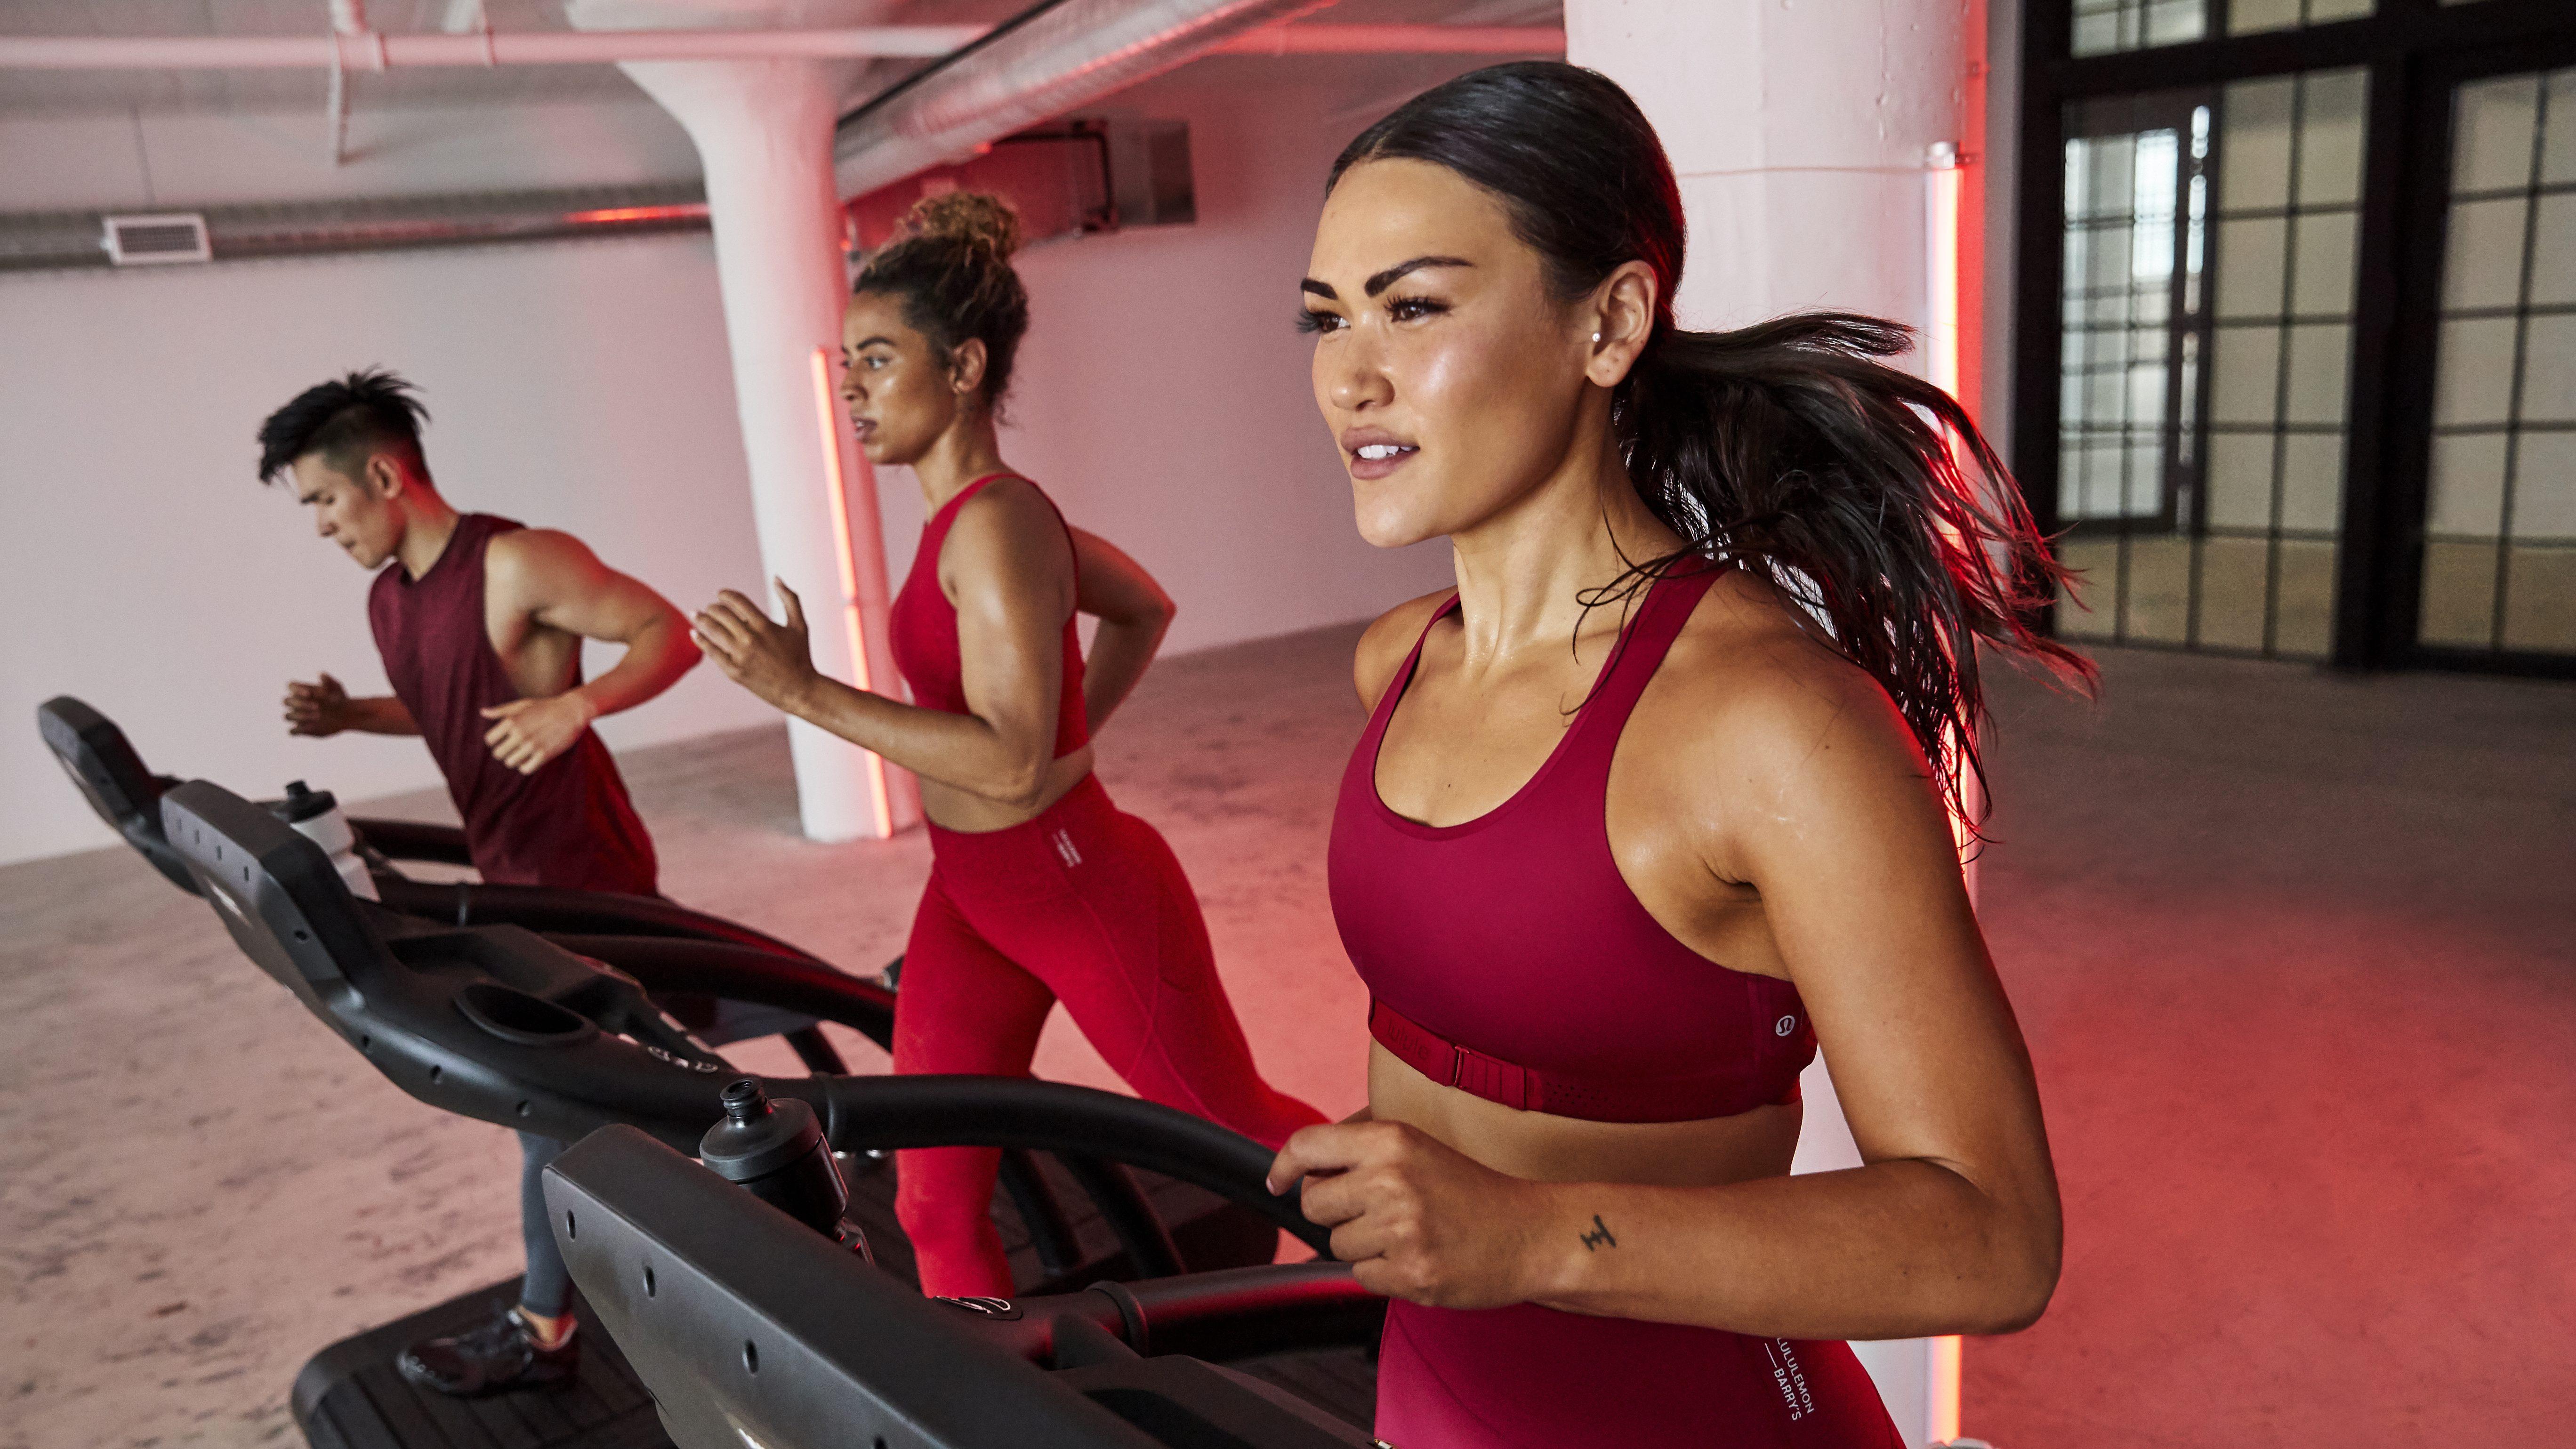 A woman runs on a treadmill